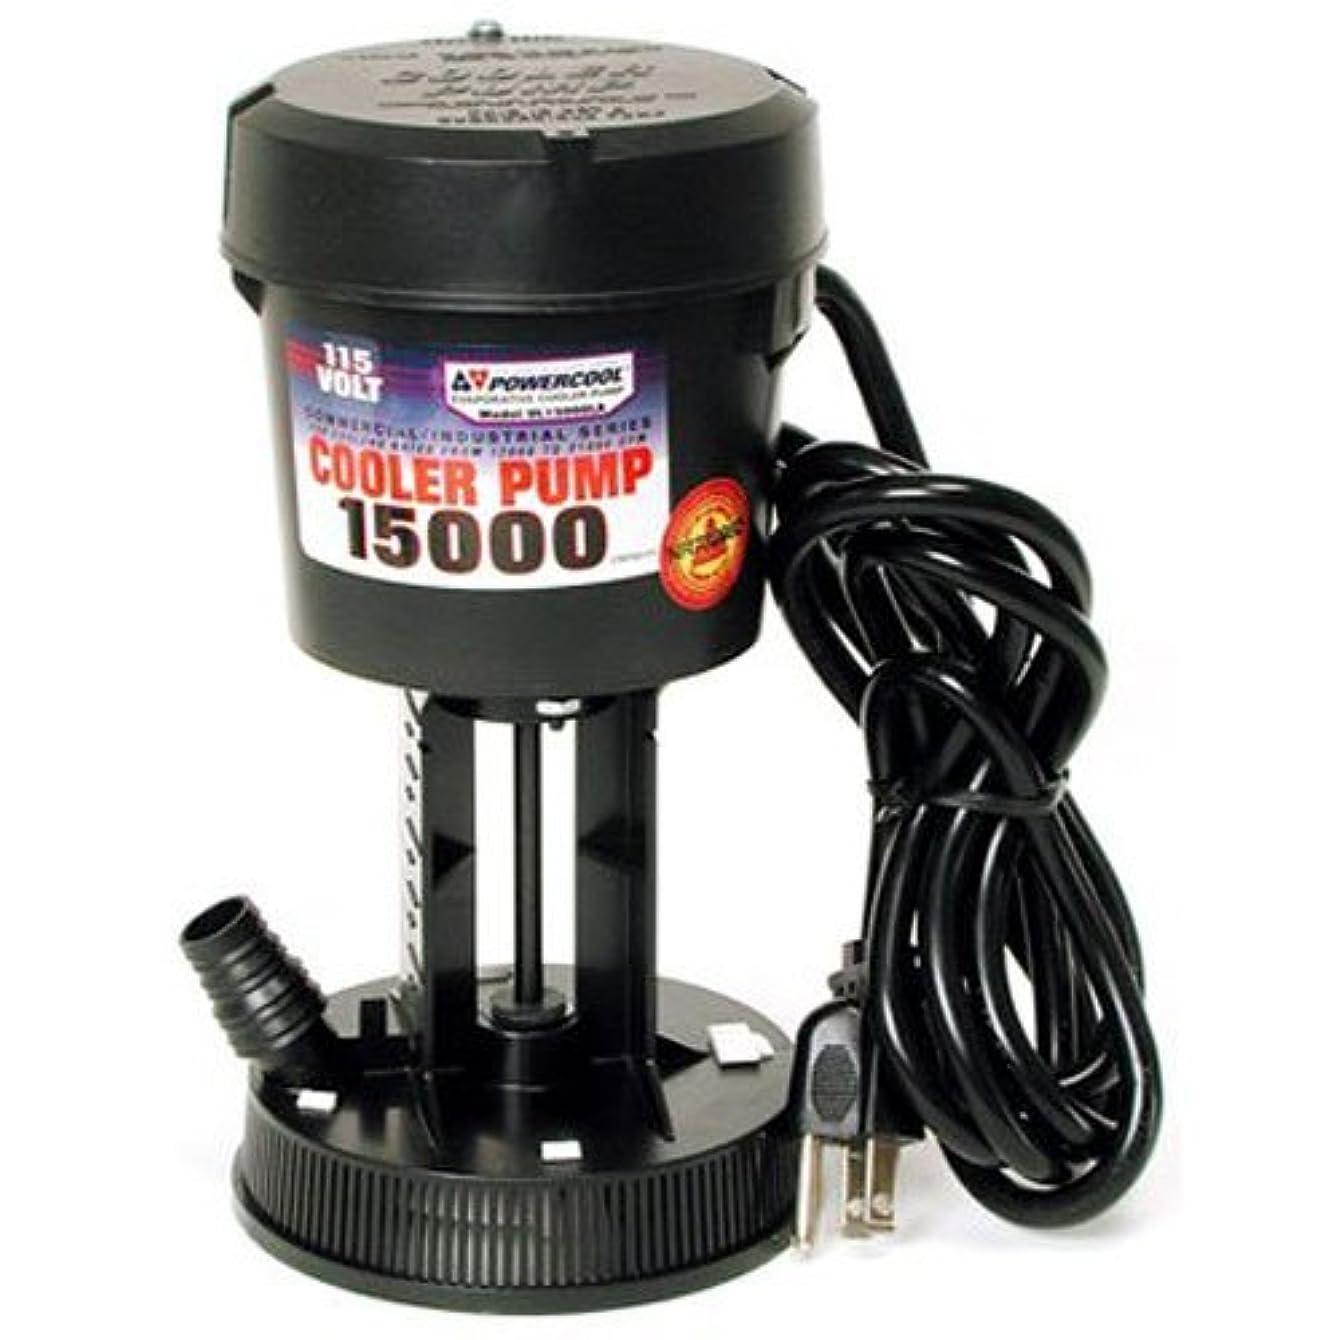 DIAL 1387 UL15000 Cooler Pump